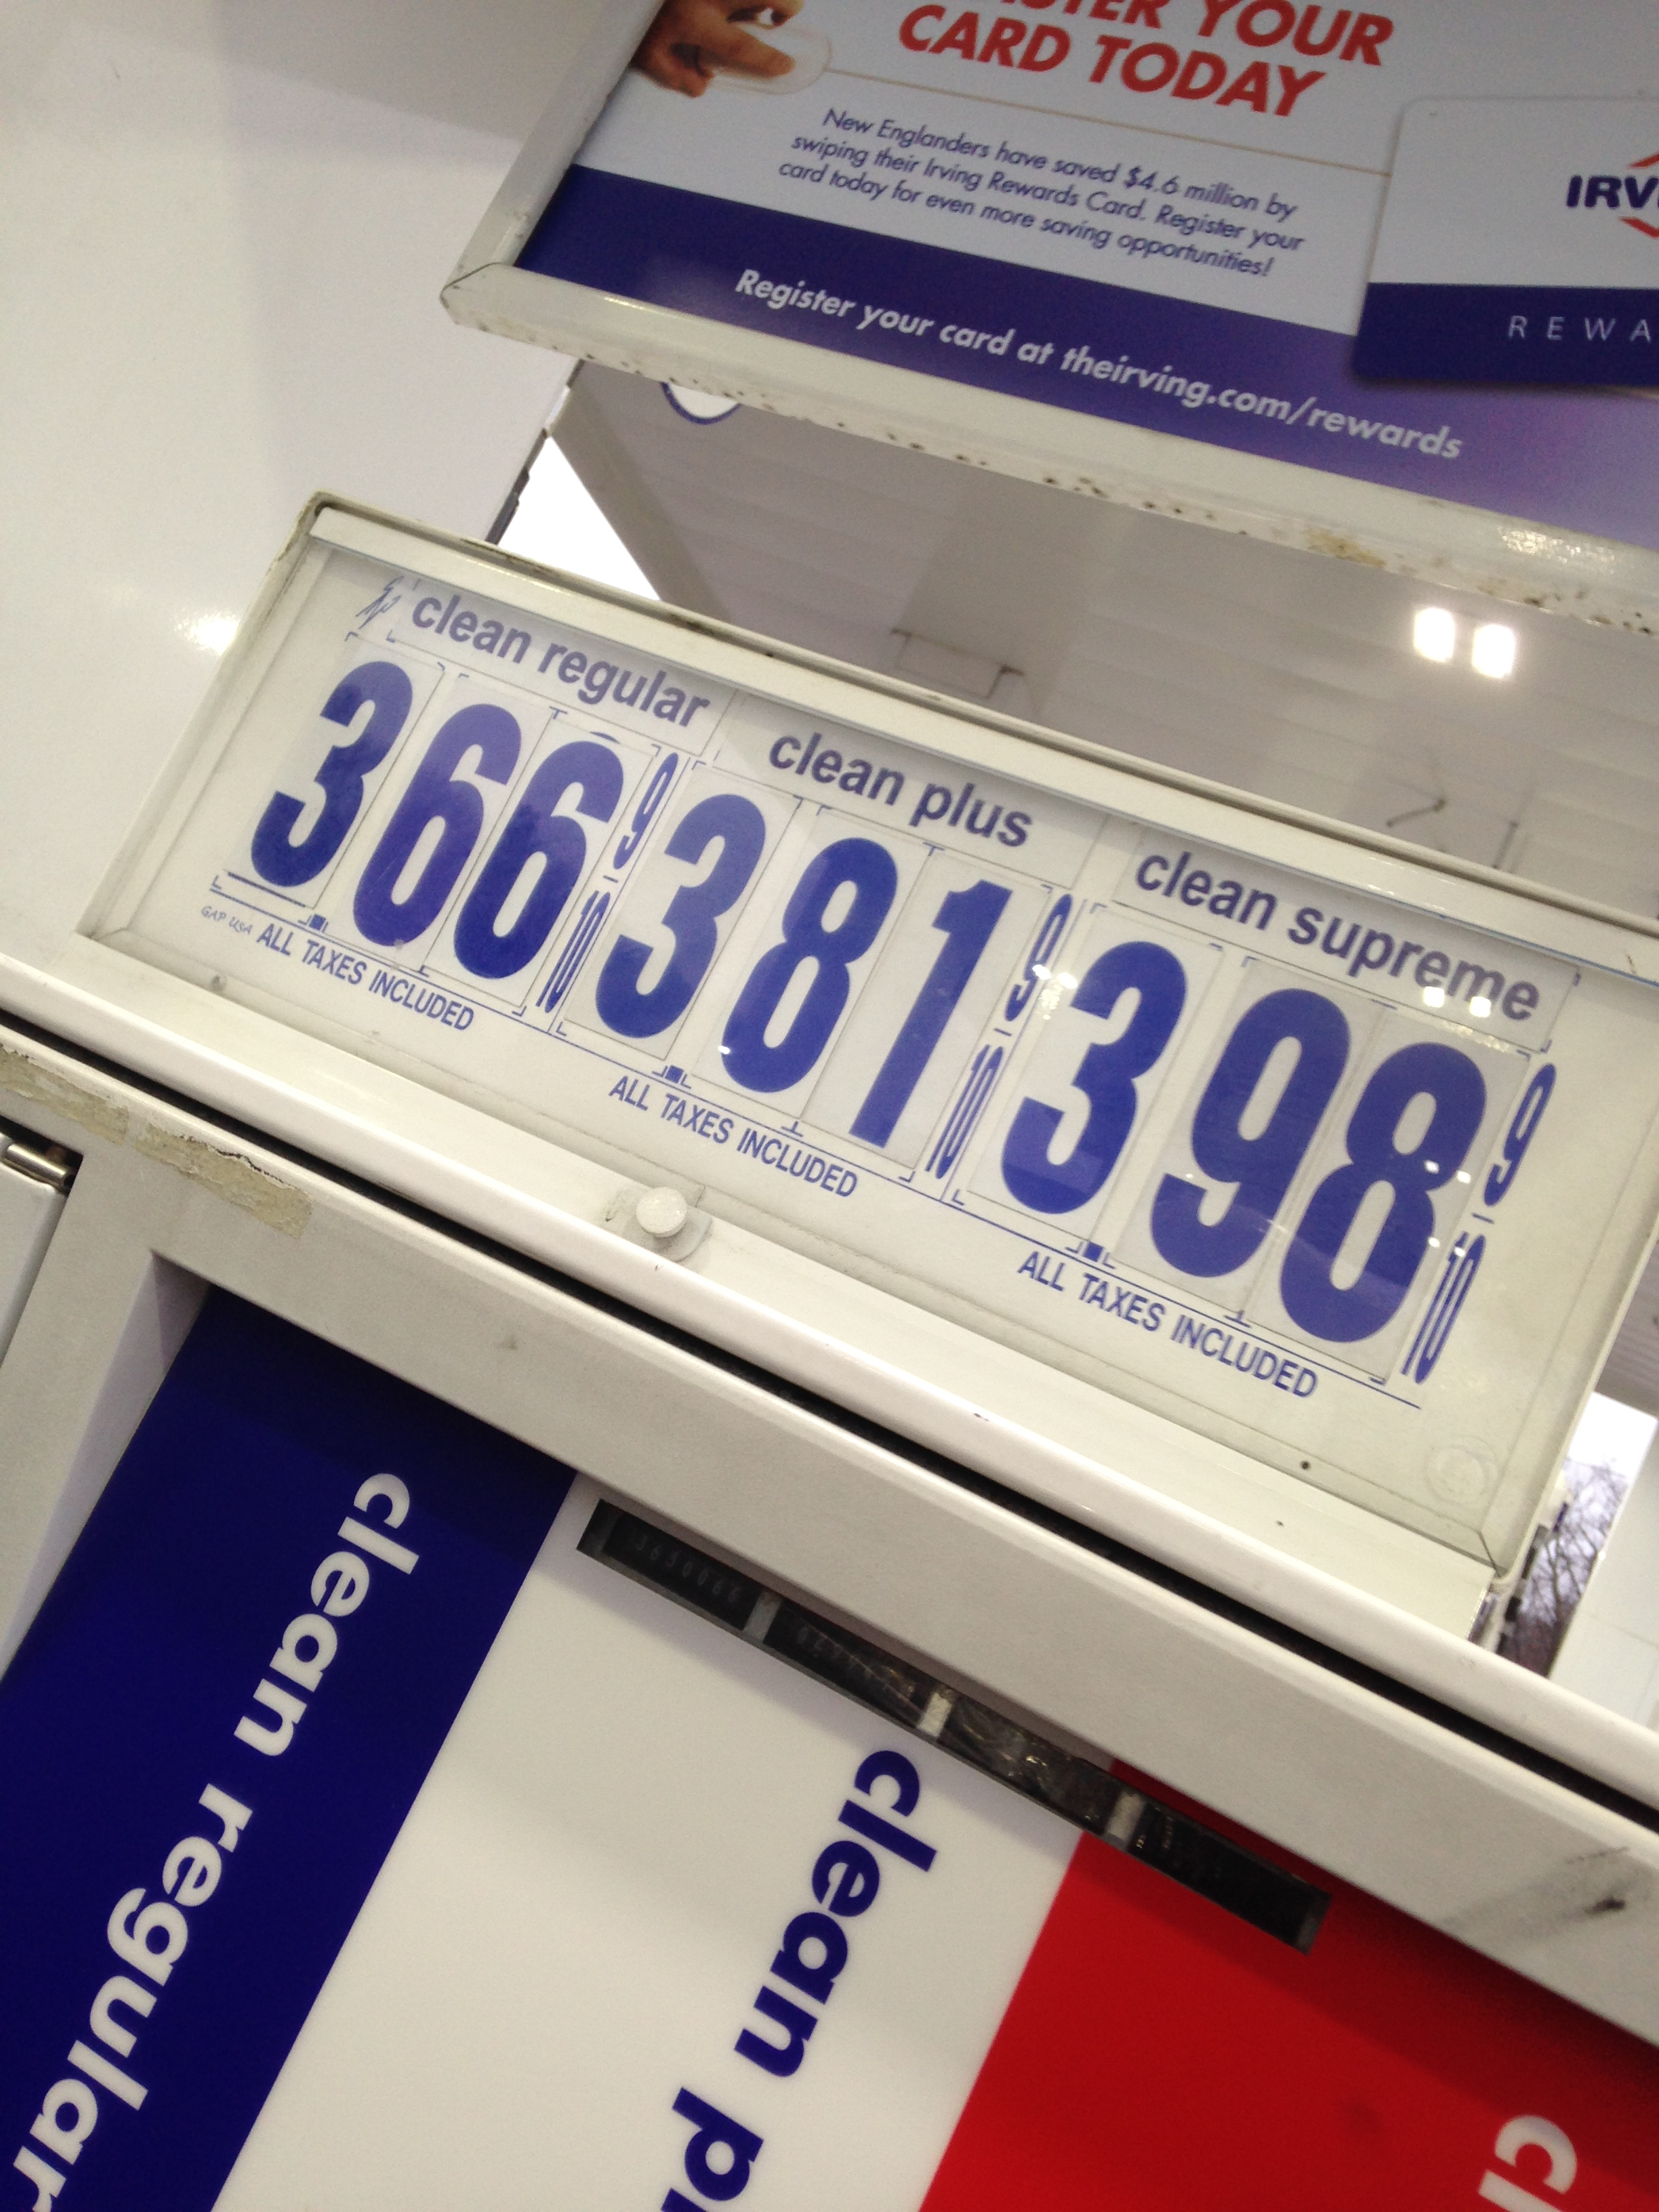 filegas prices in new hampshirejpg - Irving Rewards Card